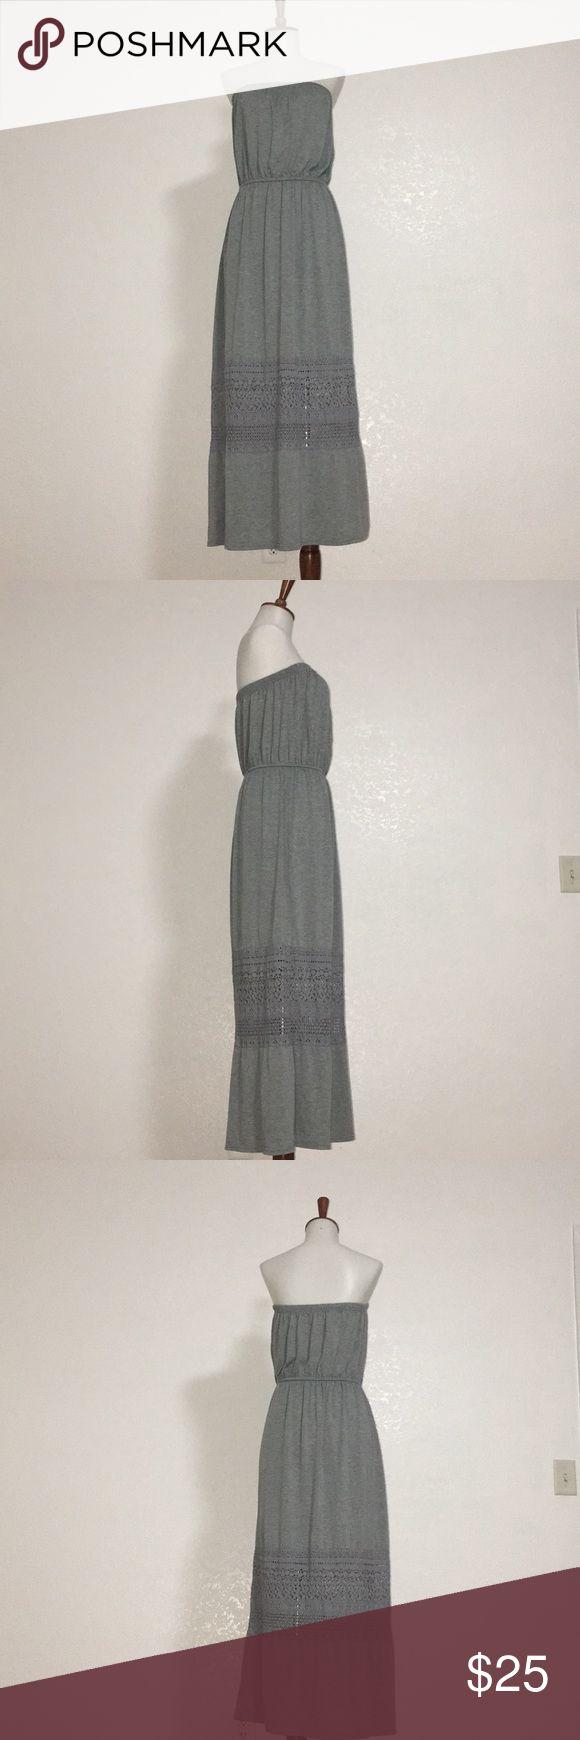 Tube dress Strapless tube Maxi dress. Gray color  Worn ones. Like new. Xhilaration Dresses Strapless